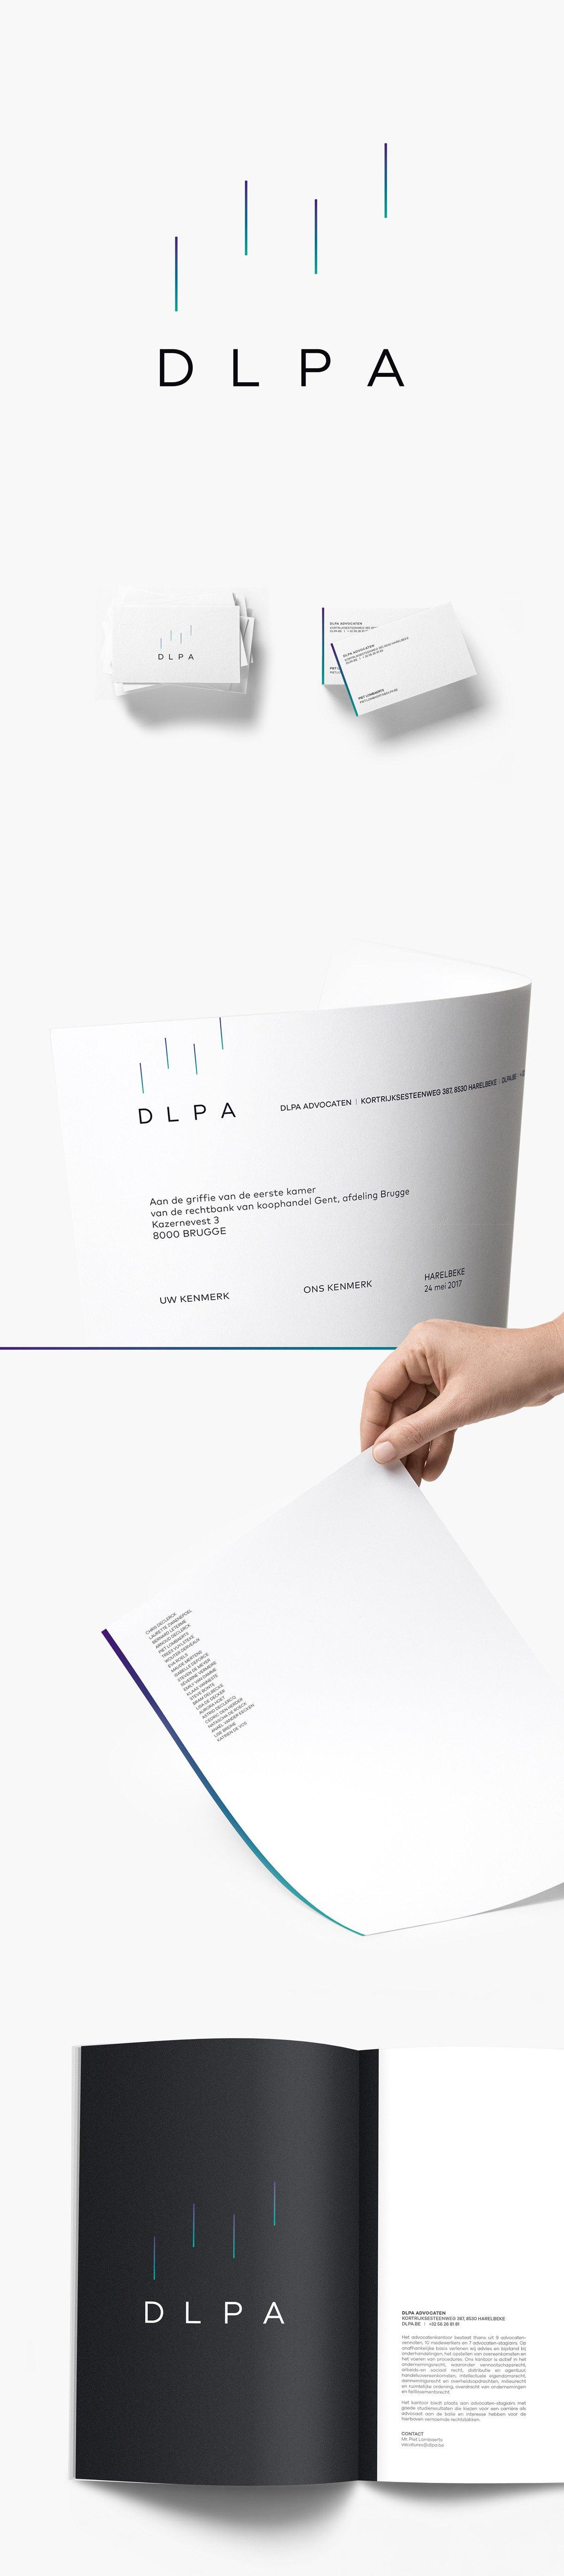 DLPA_Presentatie_01.0.jpg